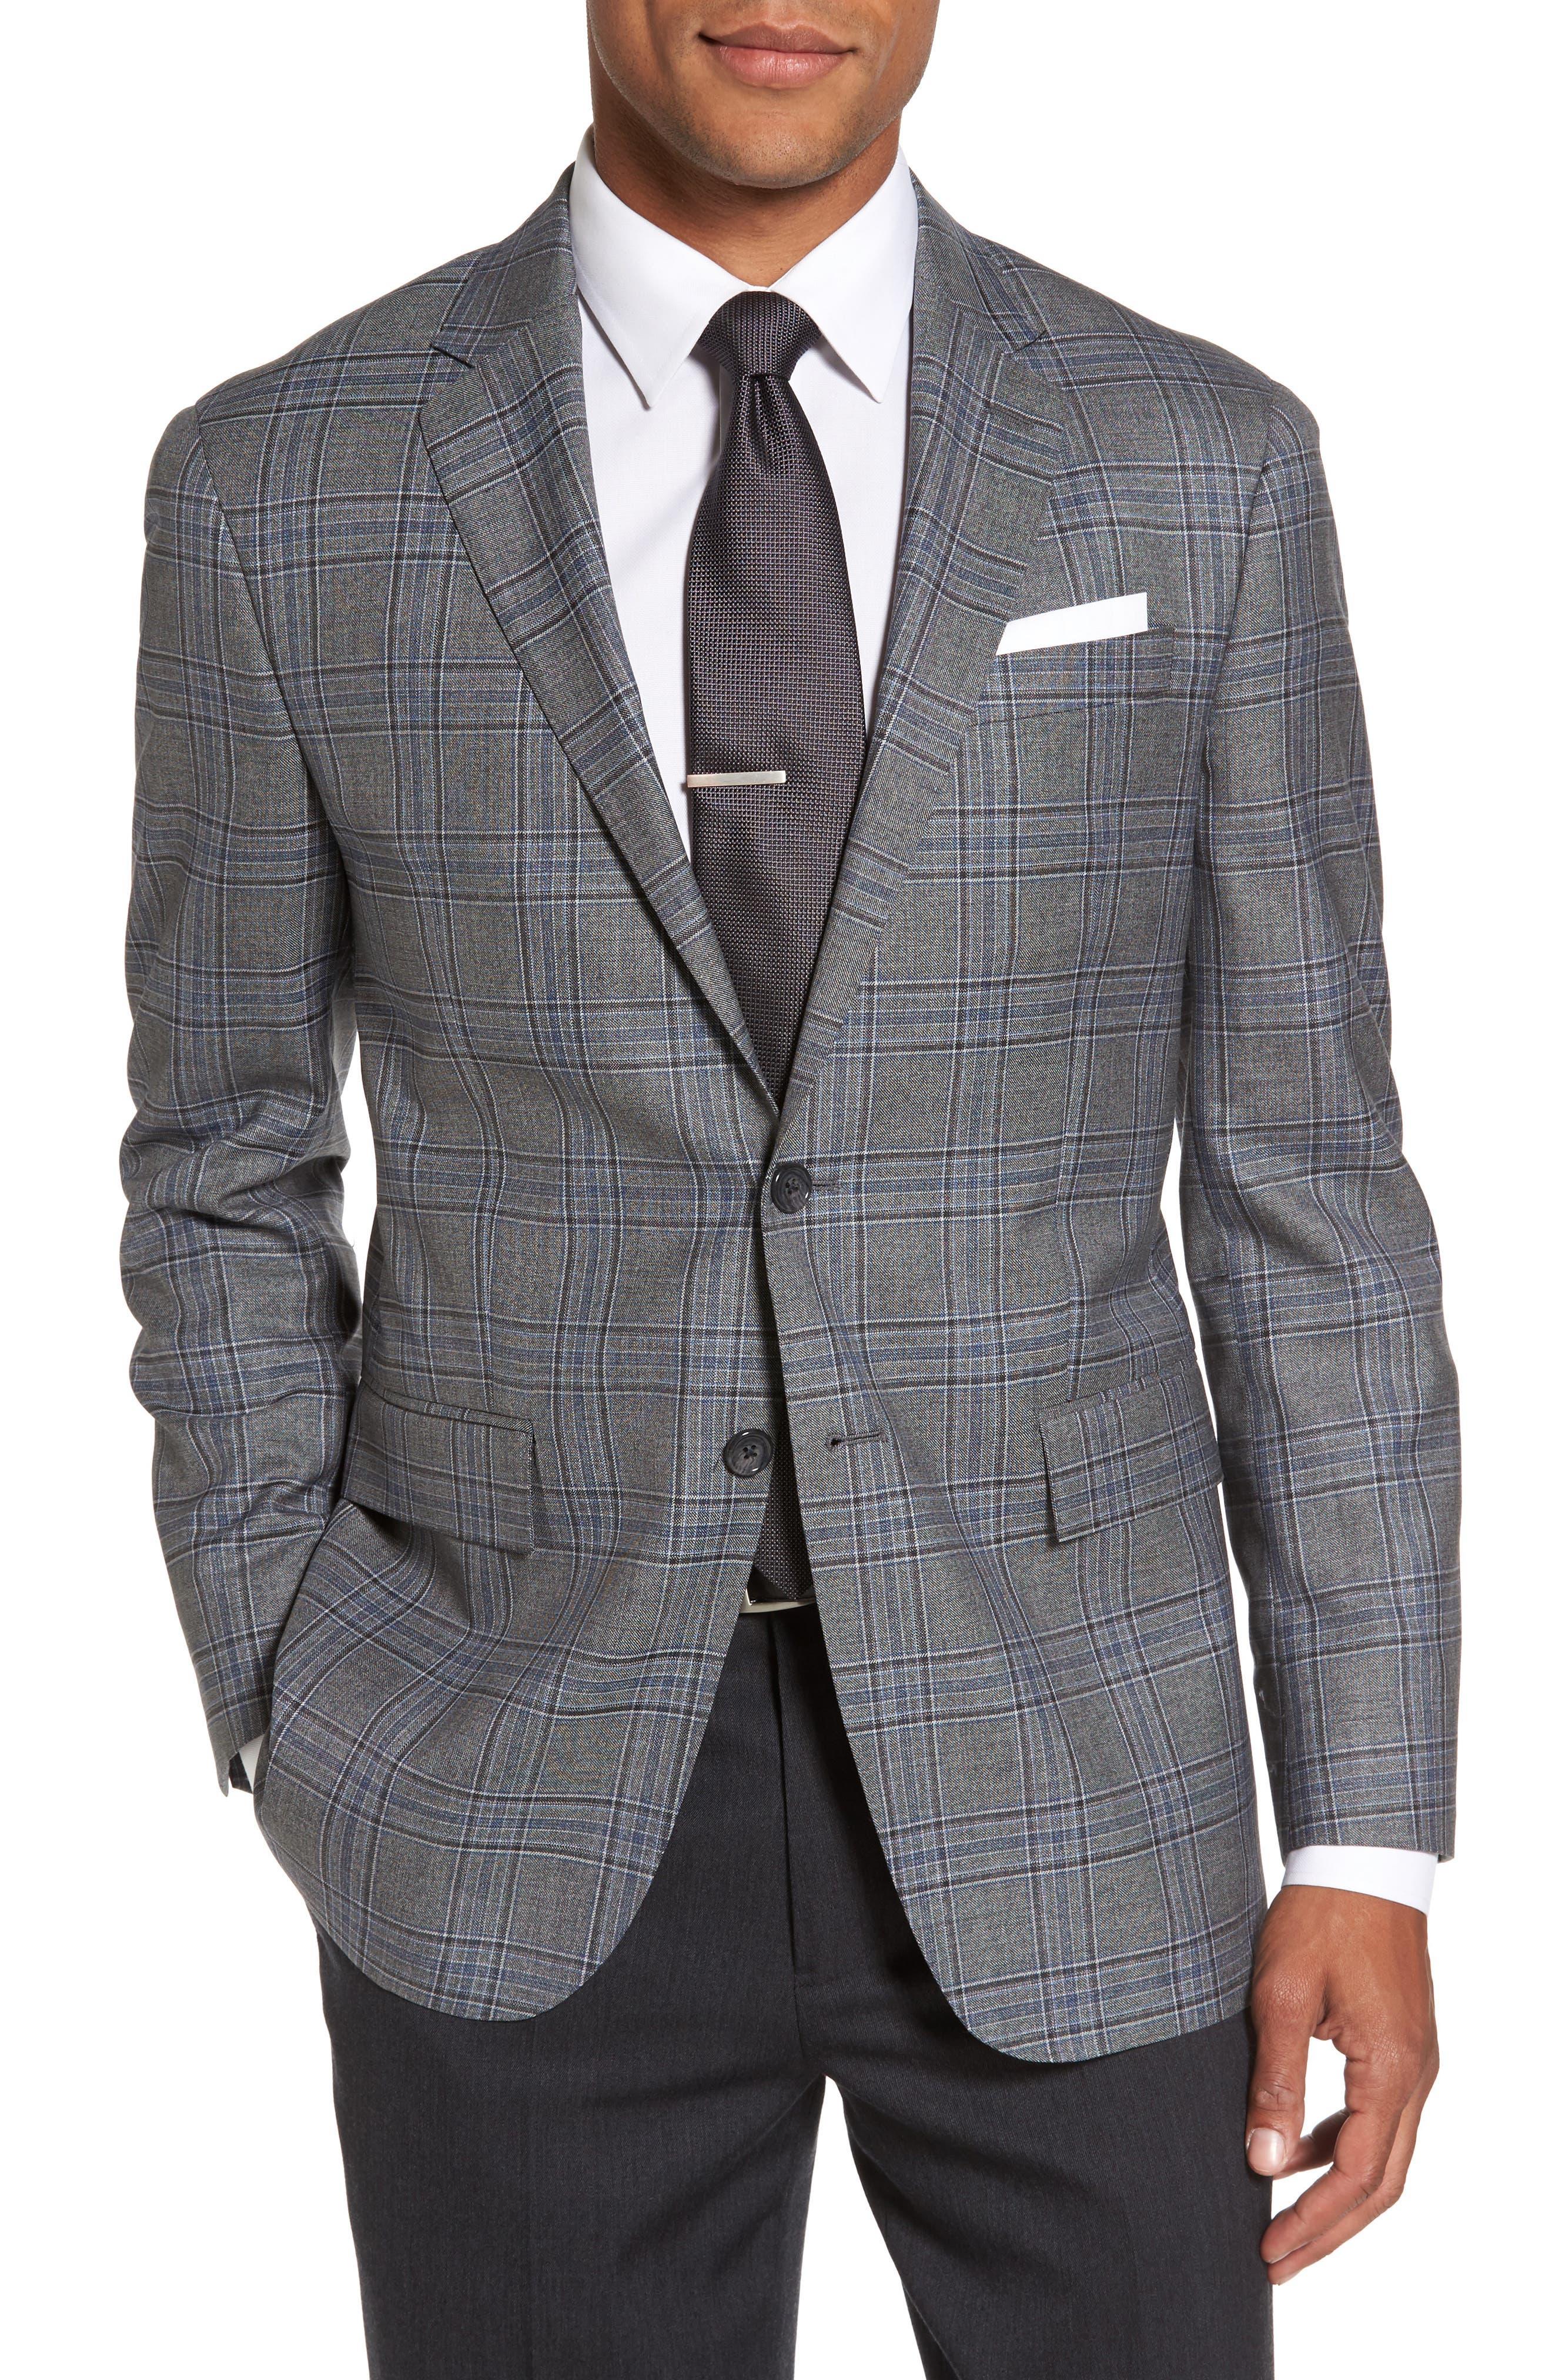 Todd Snyder White Label Trim Fit Plaid Wool Sport Coat